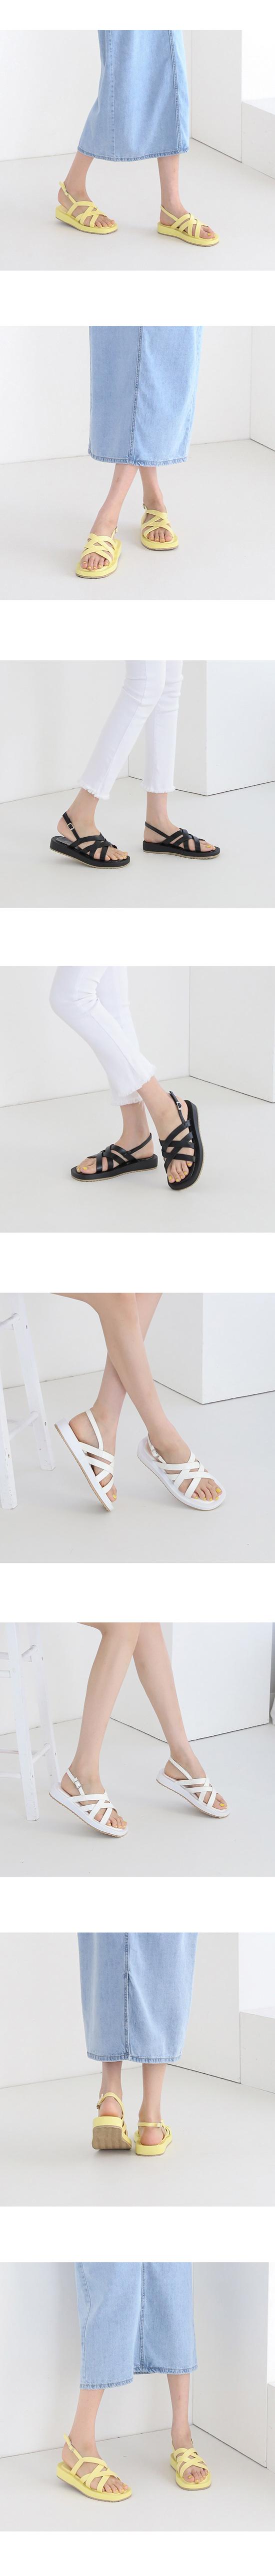 Cross Strap Flat Sandals 3cm White